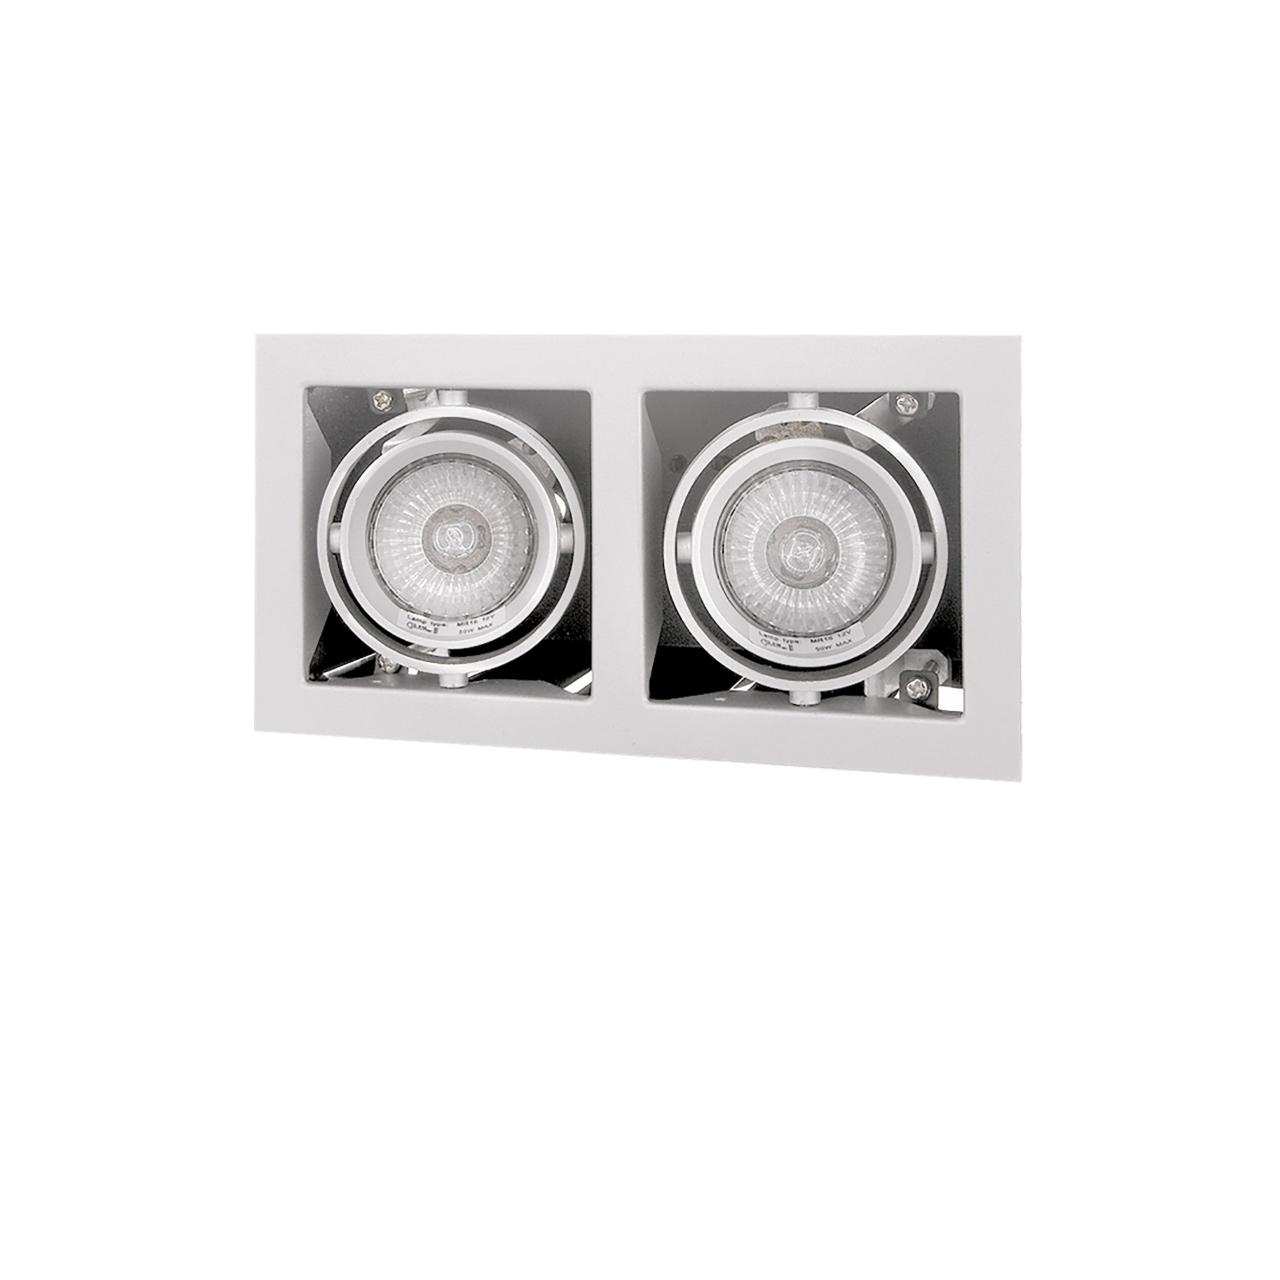 Светильник Cardano 16Х2 MR16 / HP16 белый Lightstar 214020